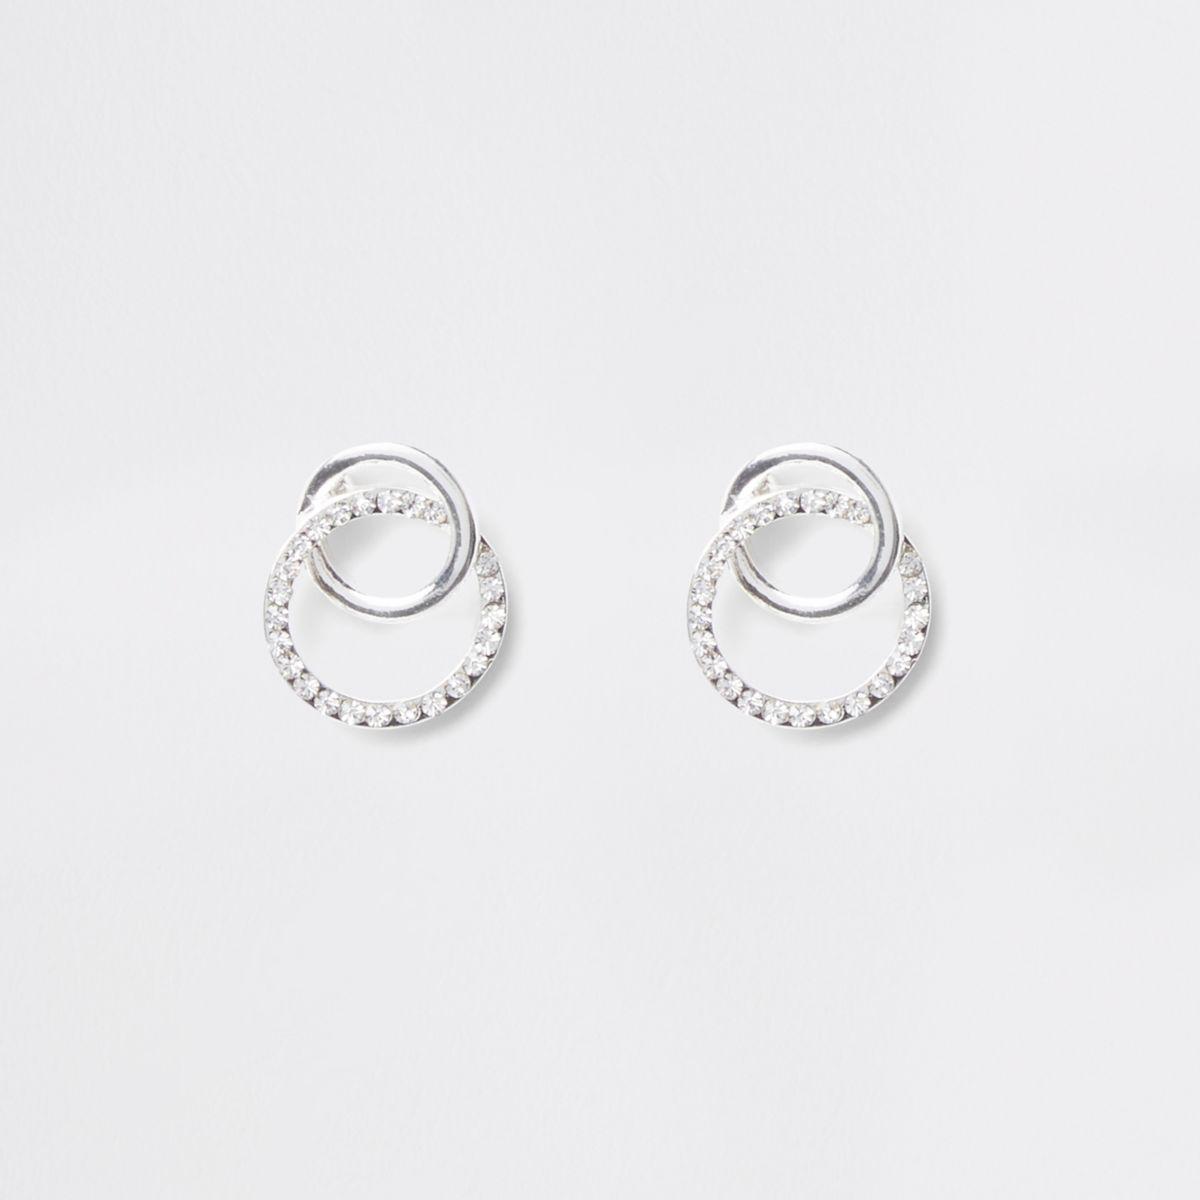 Silver tone rhinestone interlink circle studs